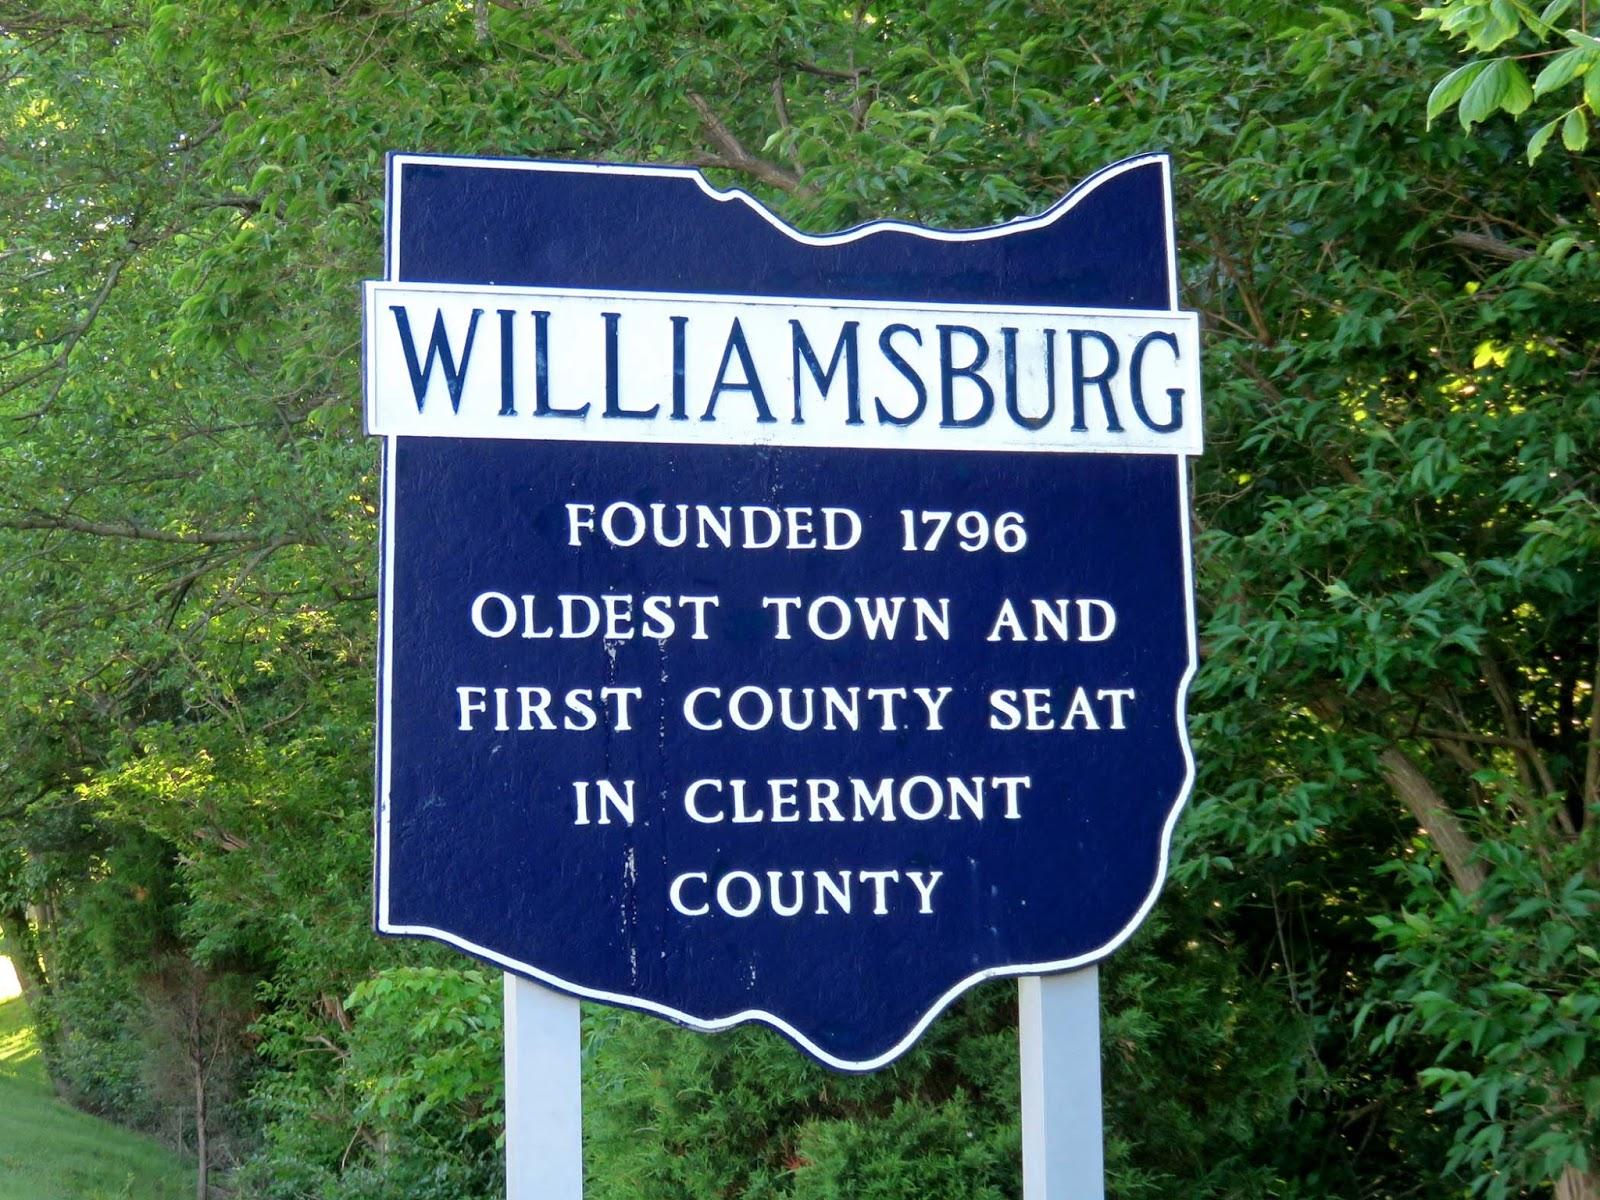 Village of Williamsburg, OH